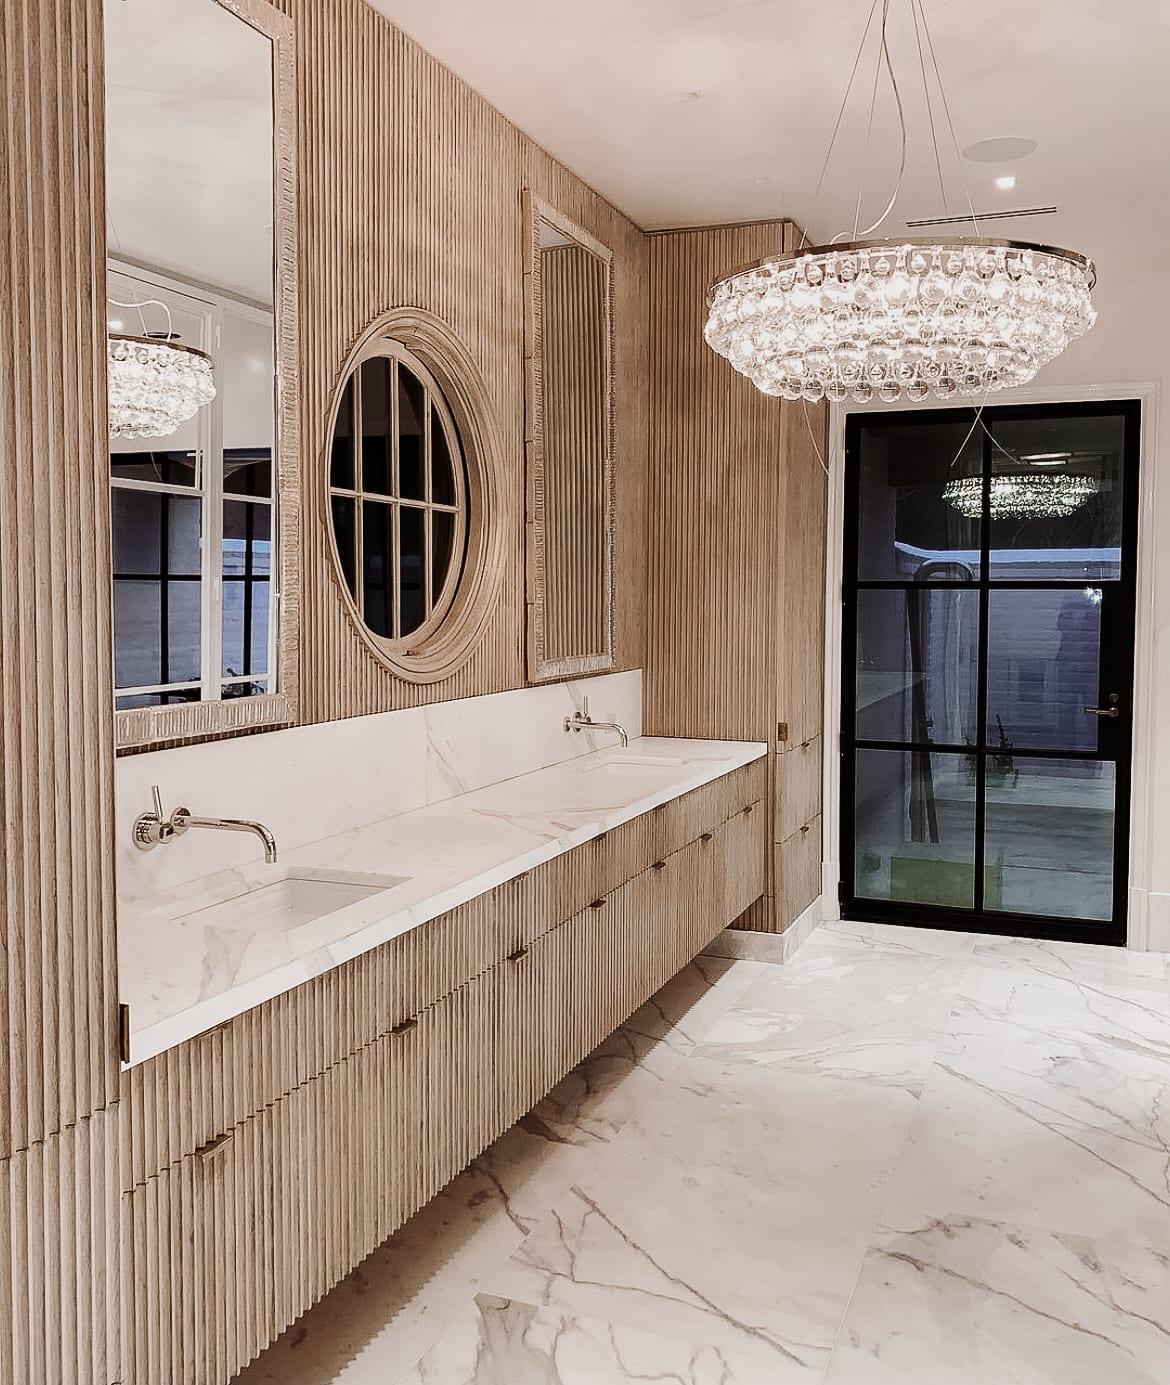 Fluted White Oak Cabinetry Set